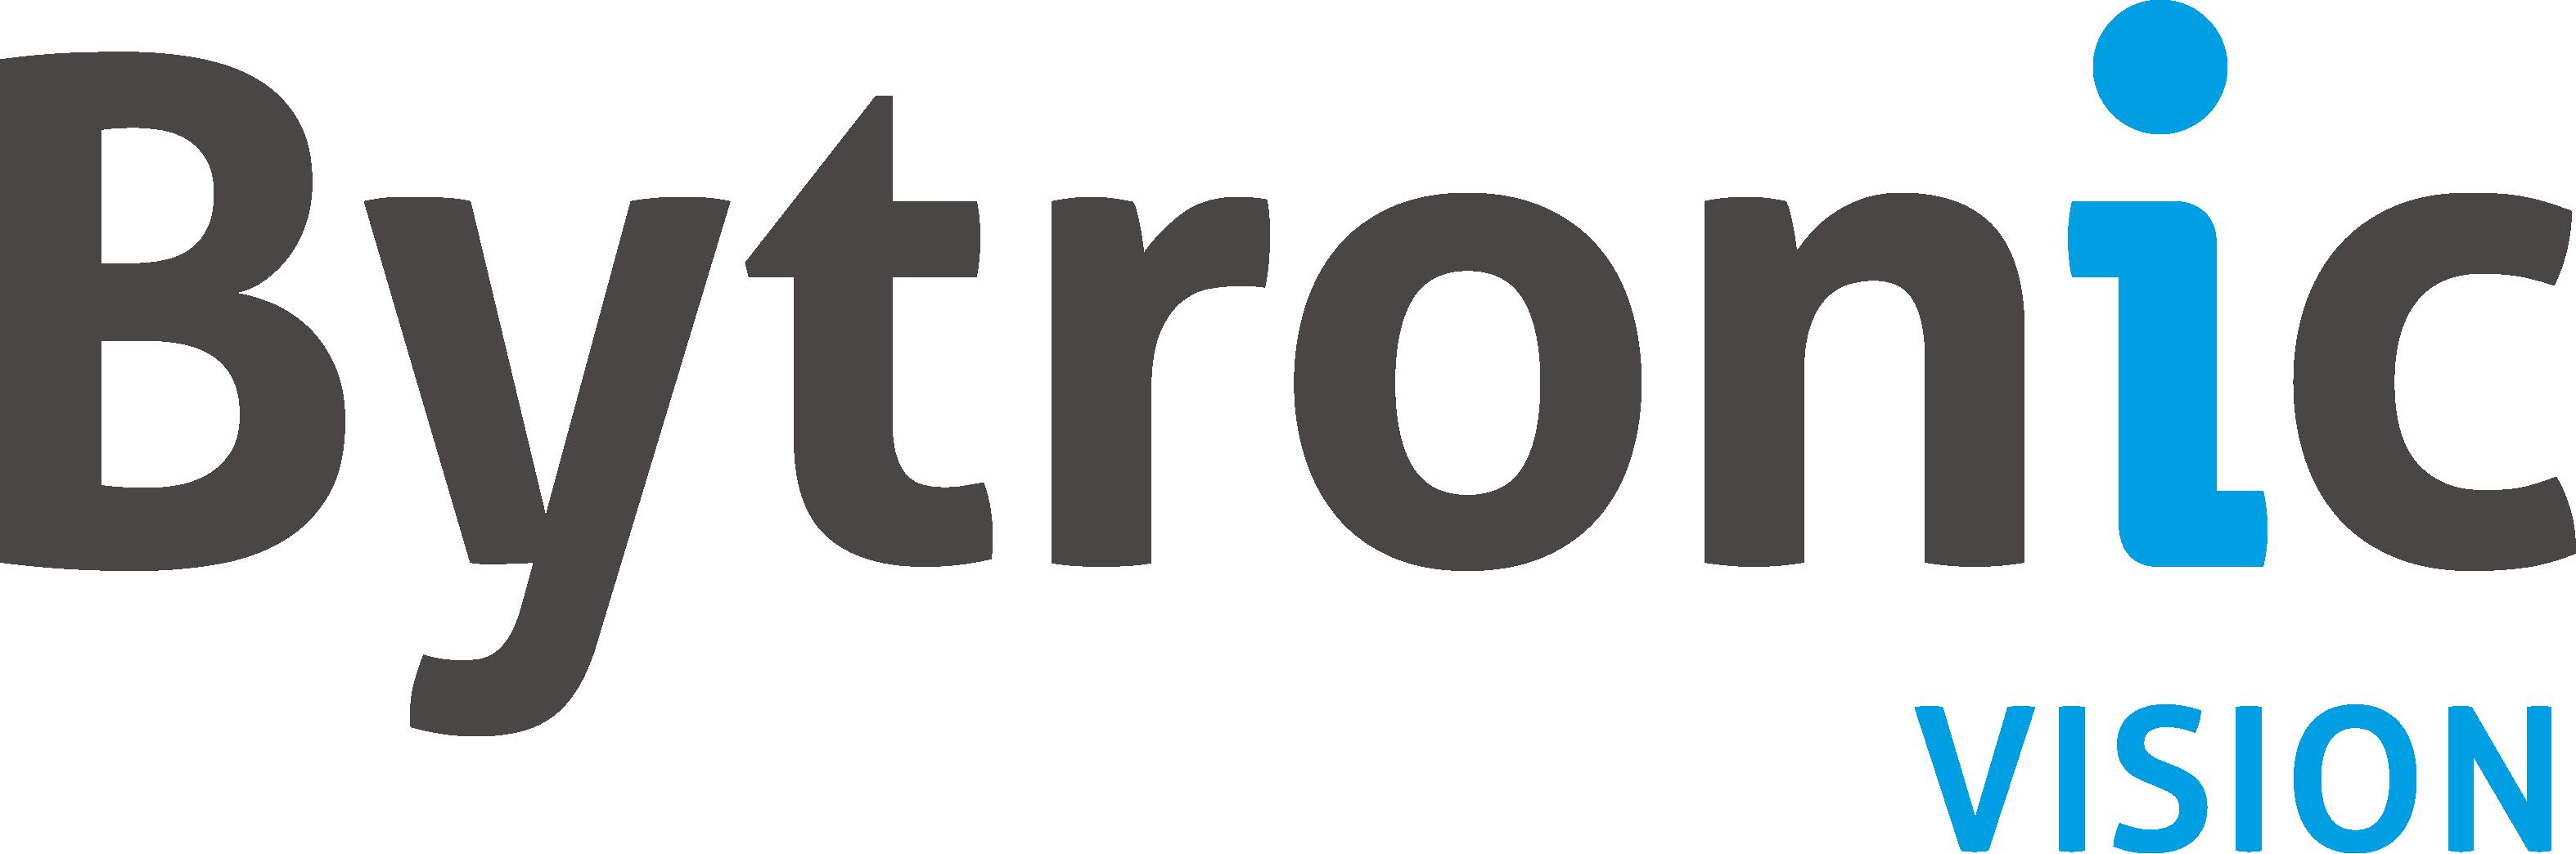 Bytronic